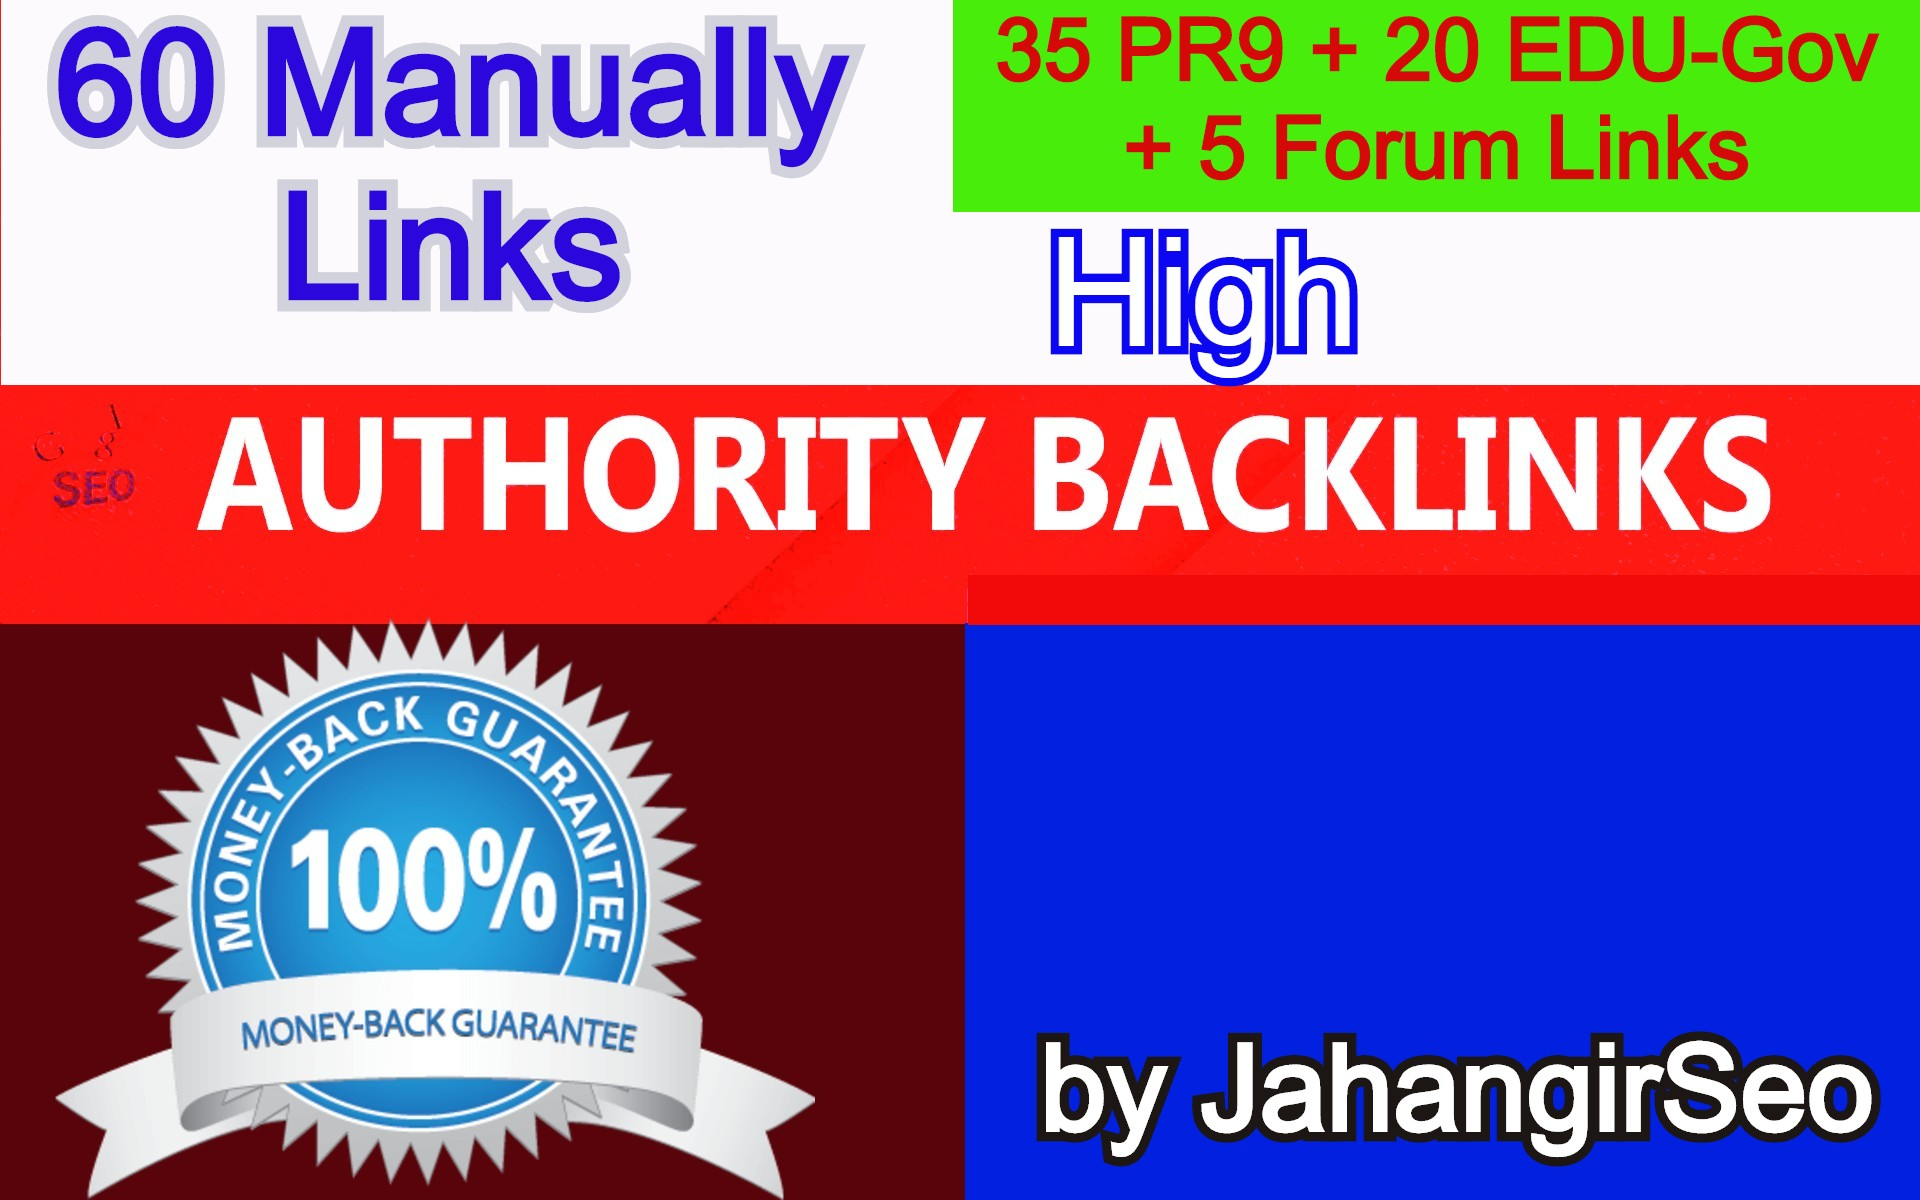 60 High Authority Backlinks From 35 HQ Profile + 20 Edu-Gov Profile + 5 Forum Profile Links